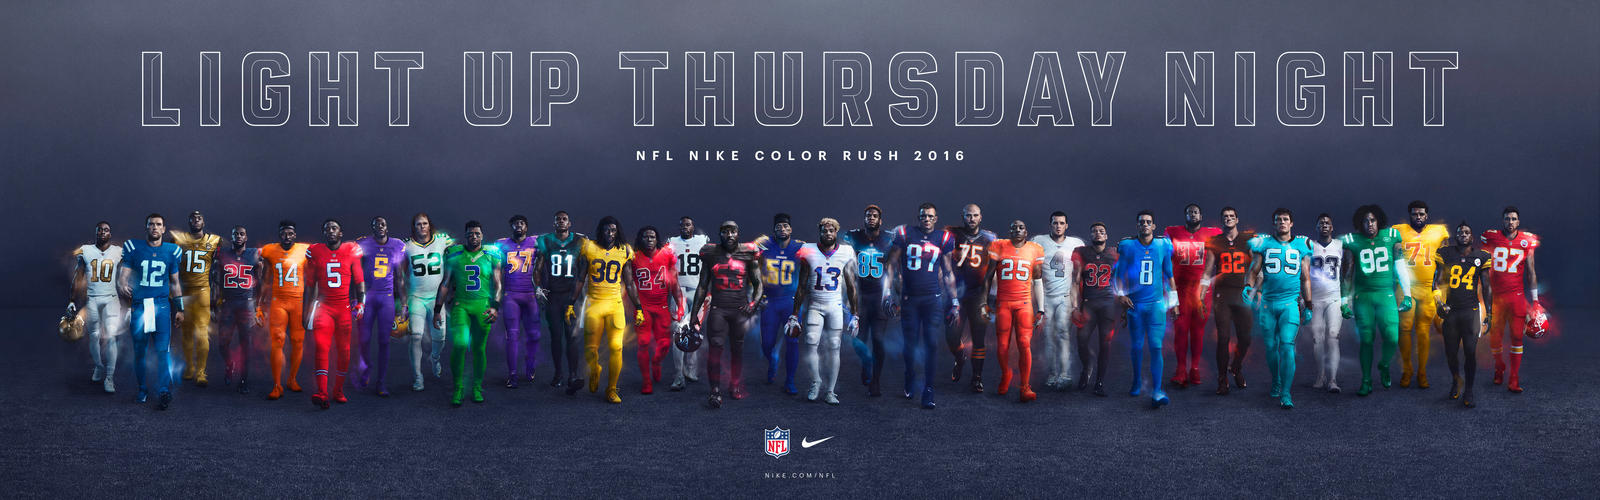 Color Rush Team Comp Crop